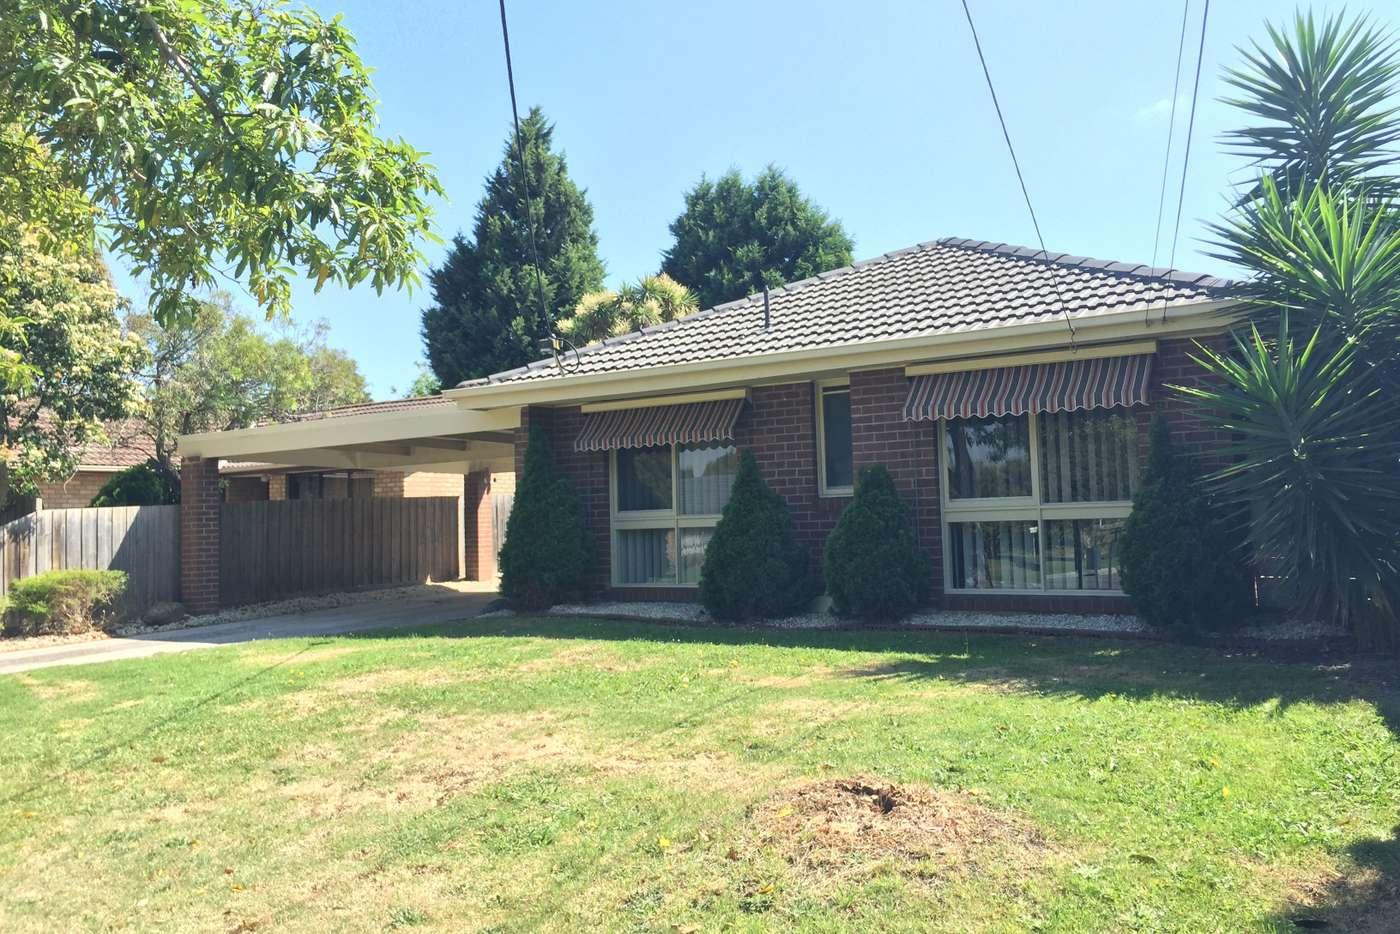 Main view of Homely house listing, 155 Carlton Road, Dandenong North VIC 3175